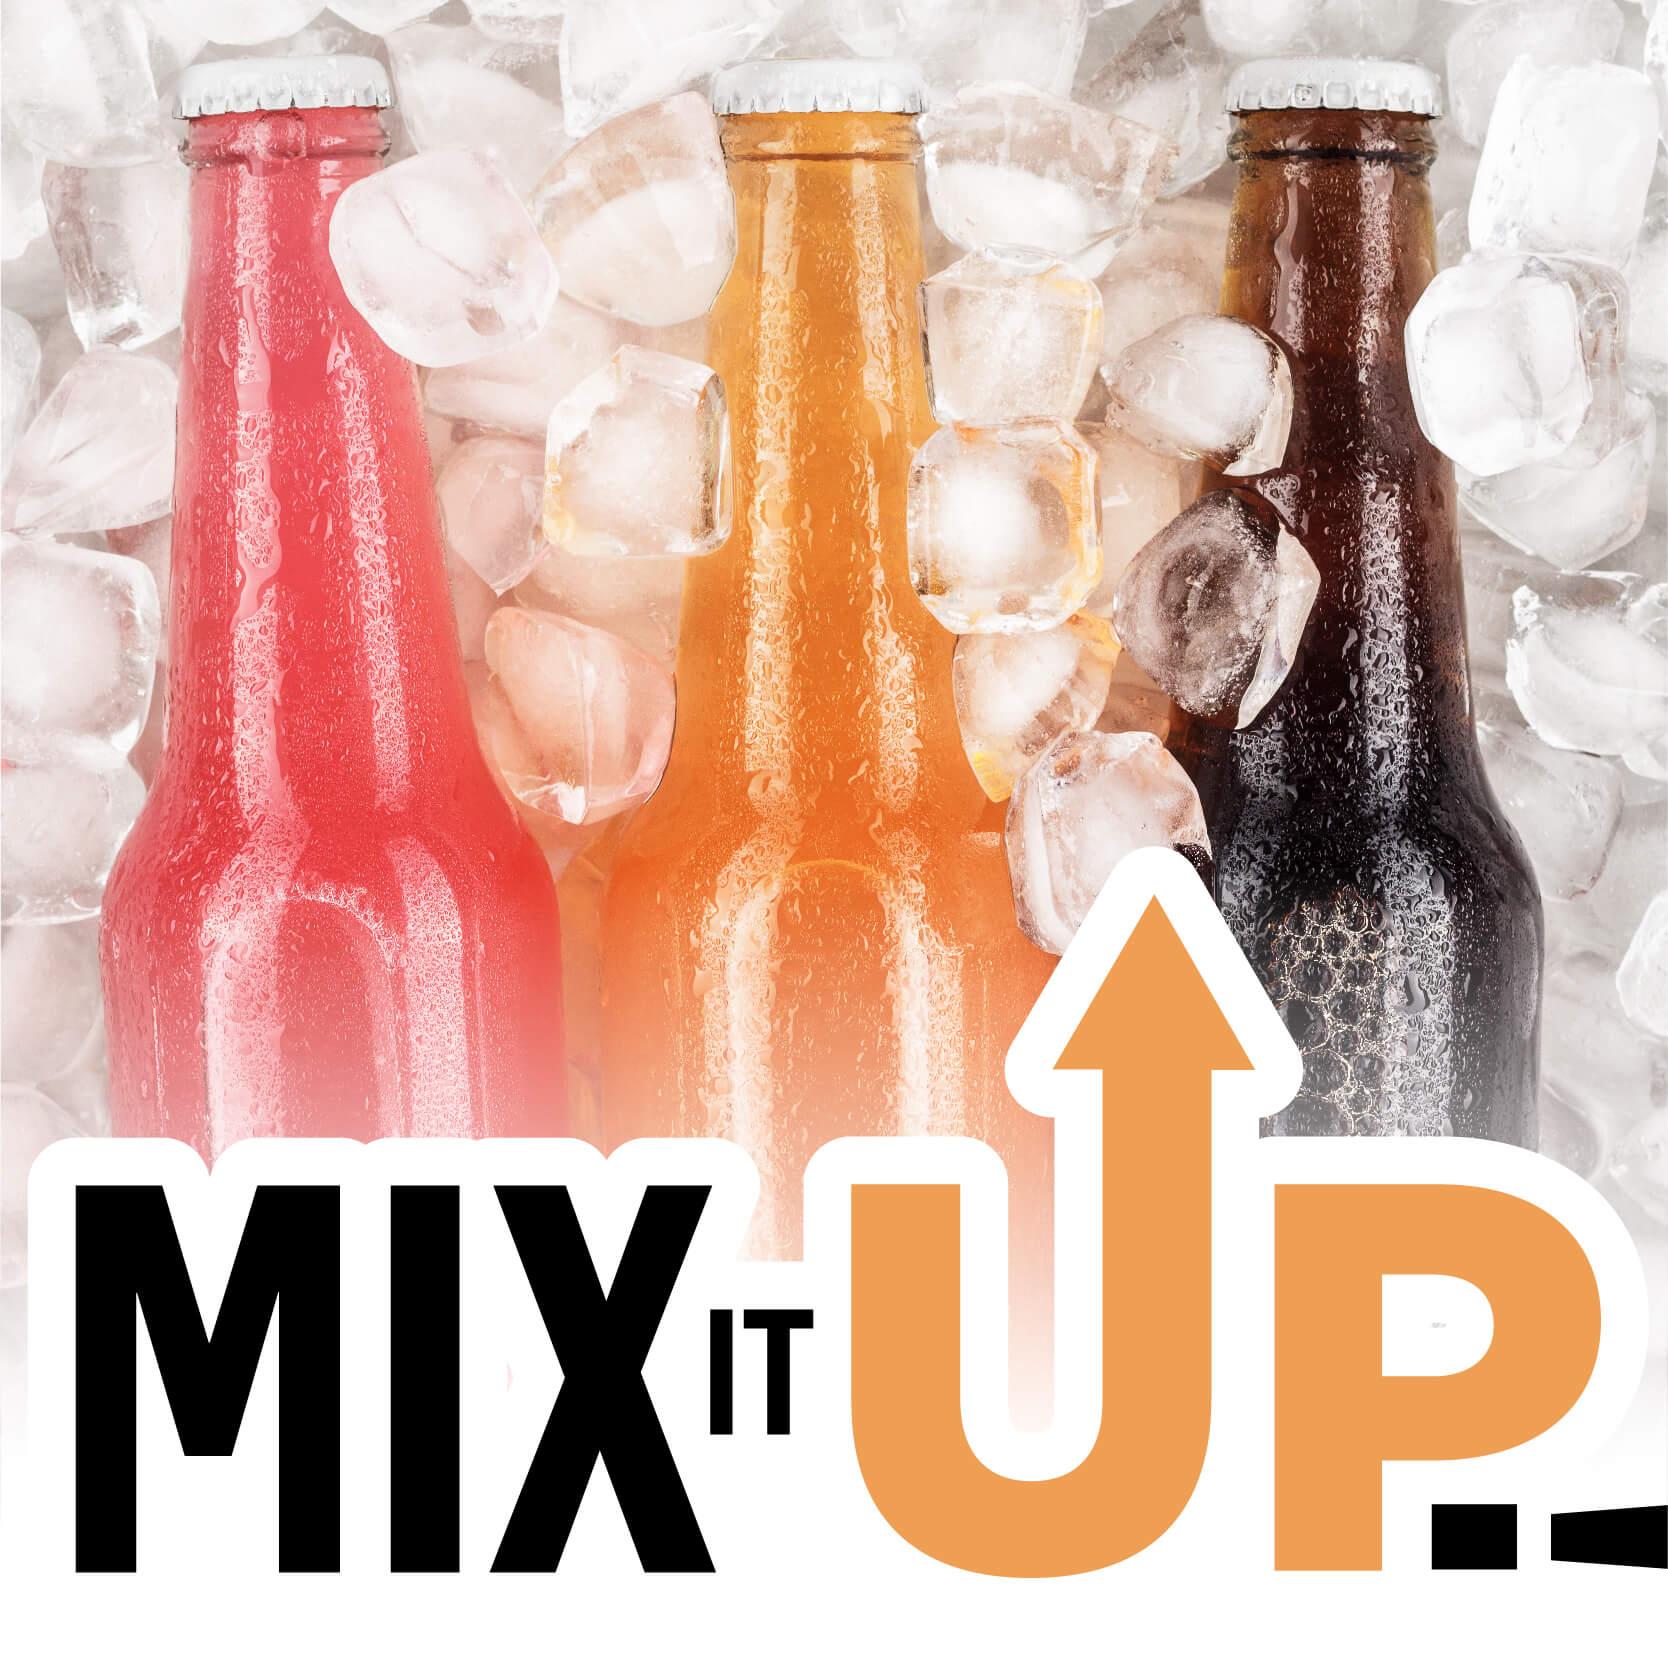 mixer-packs-content-en